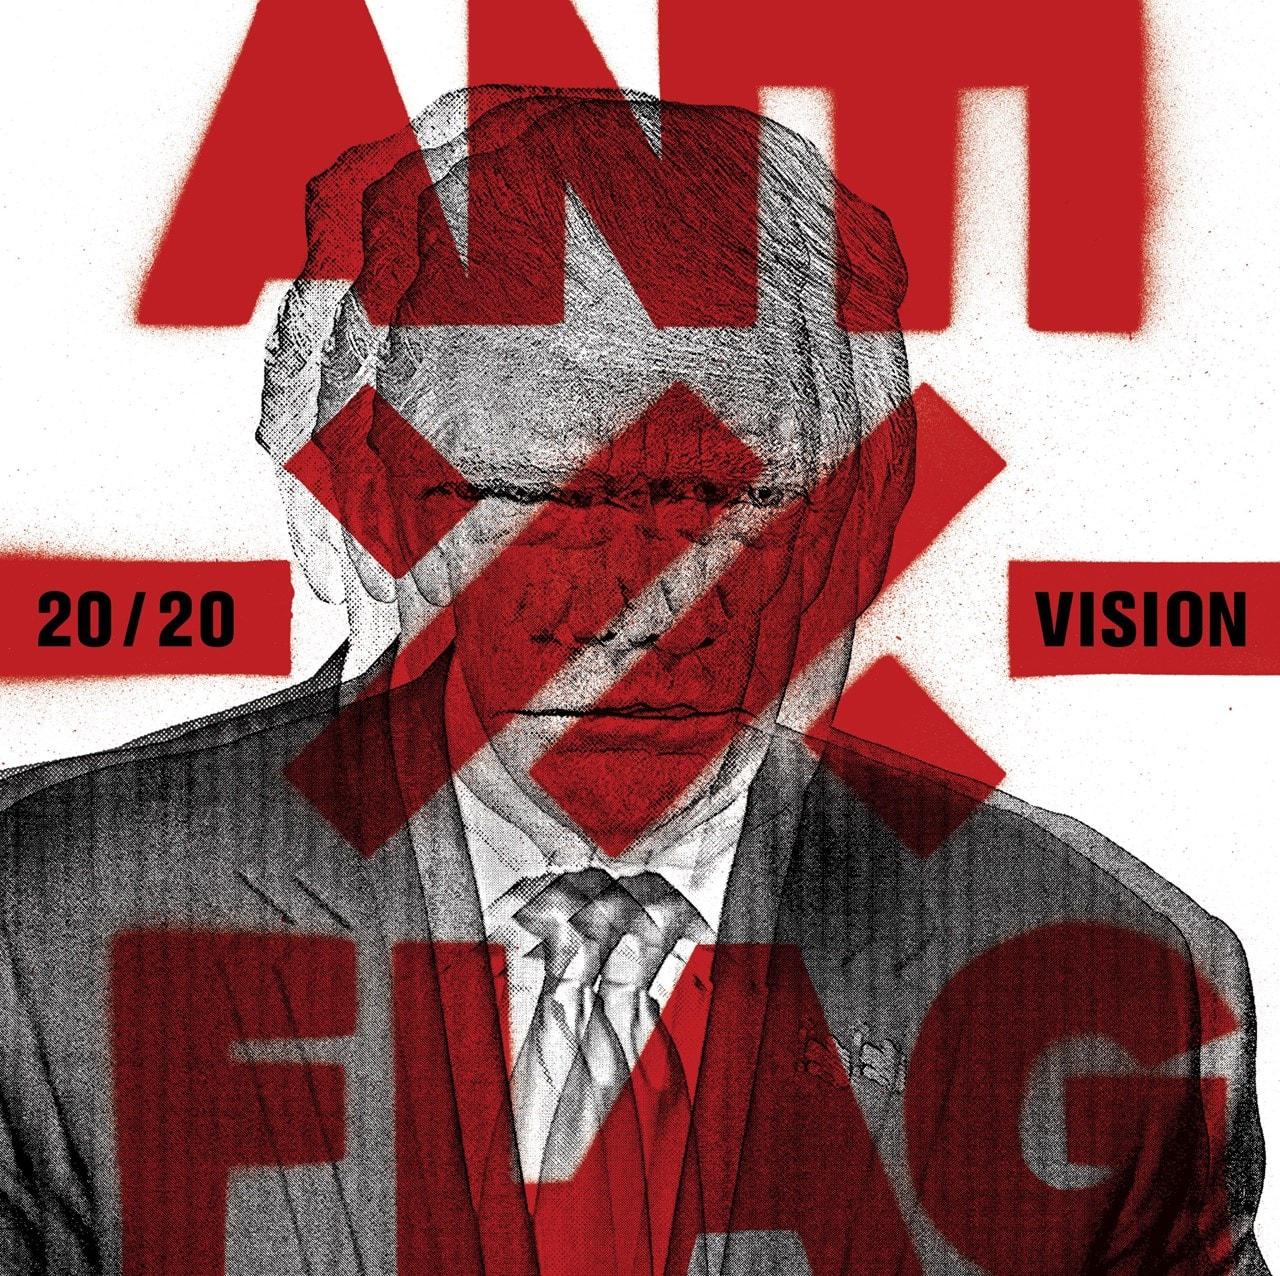 20/20 Vision - 1